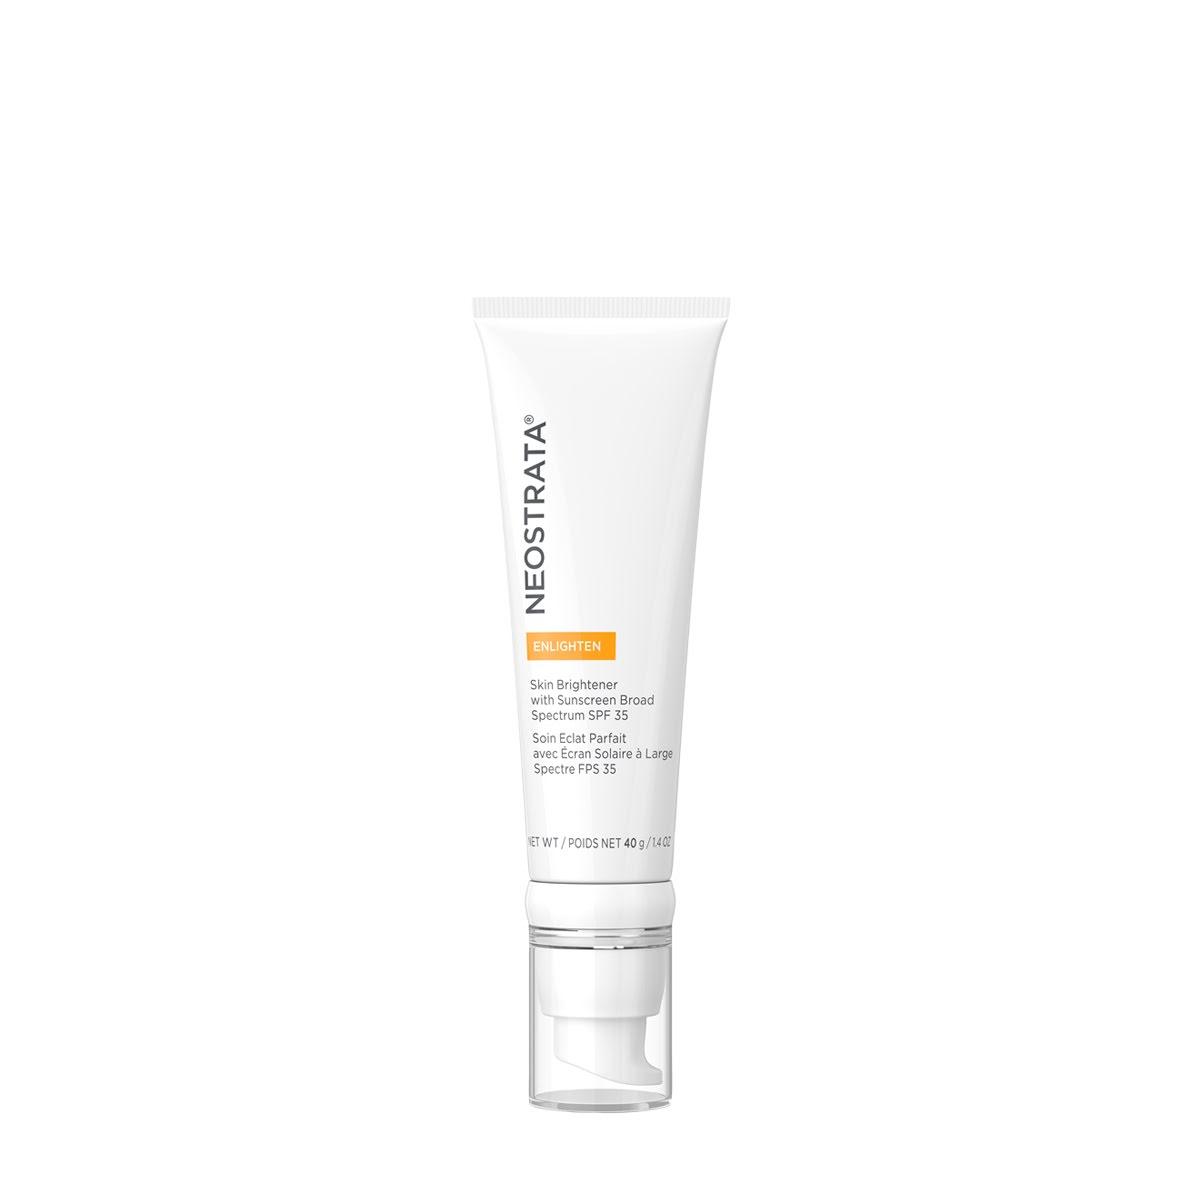 enlighten skin brightener spf 35